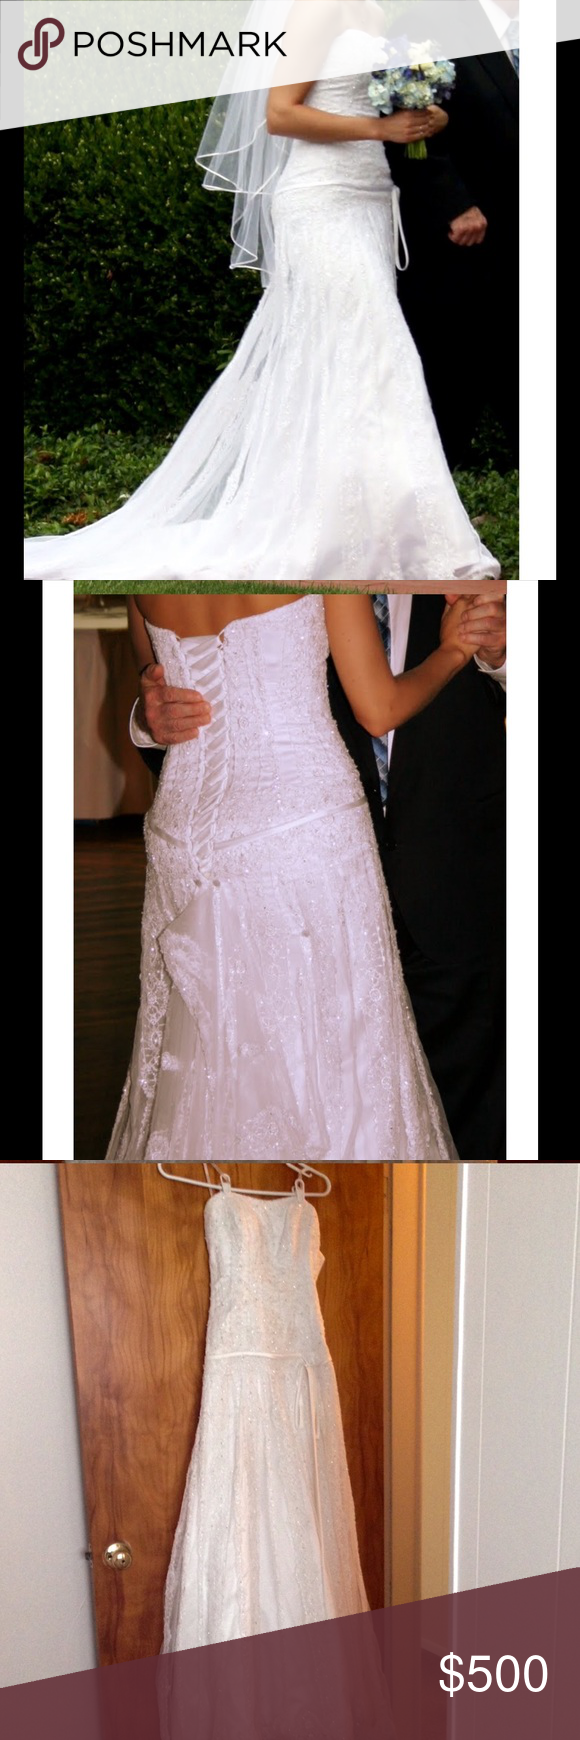 Wedding dress dry cleaning near me  Maggie Sottoro Wedding Dress  Pinterest  Champagne veil Gatsby